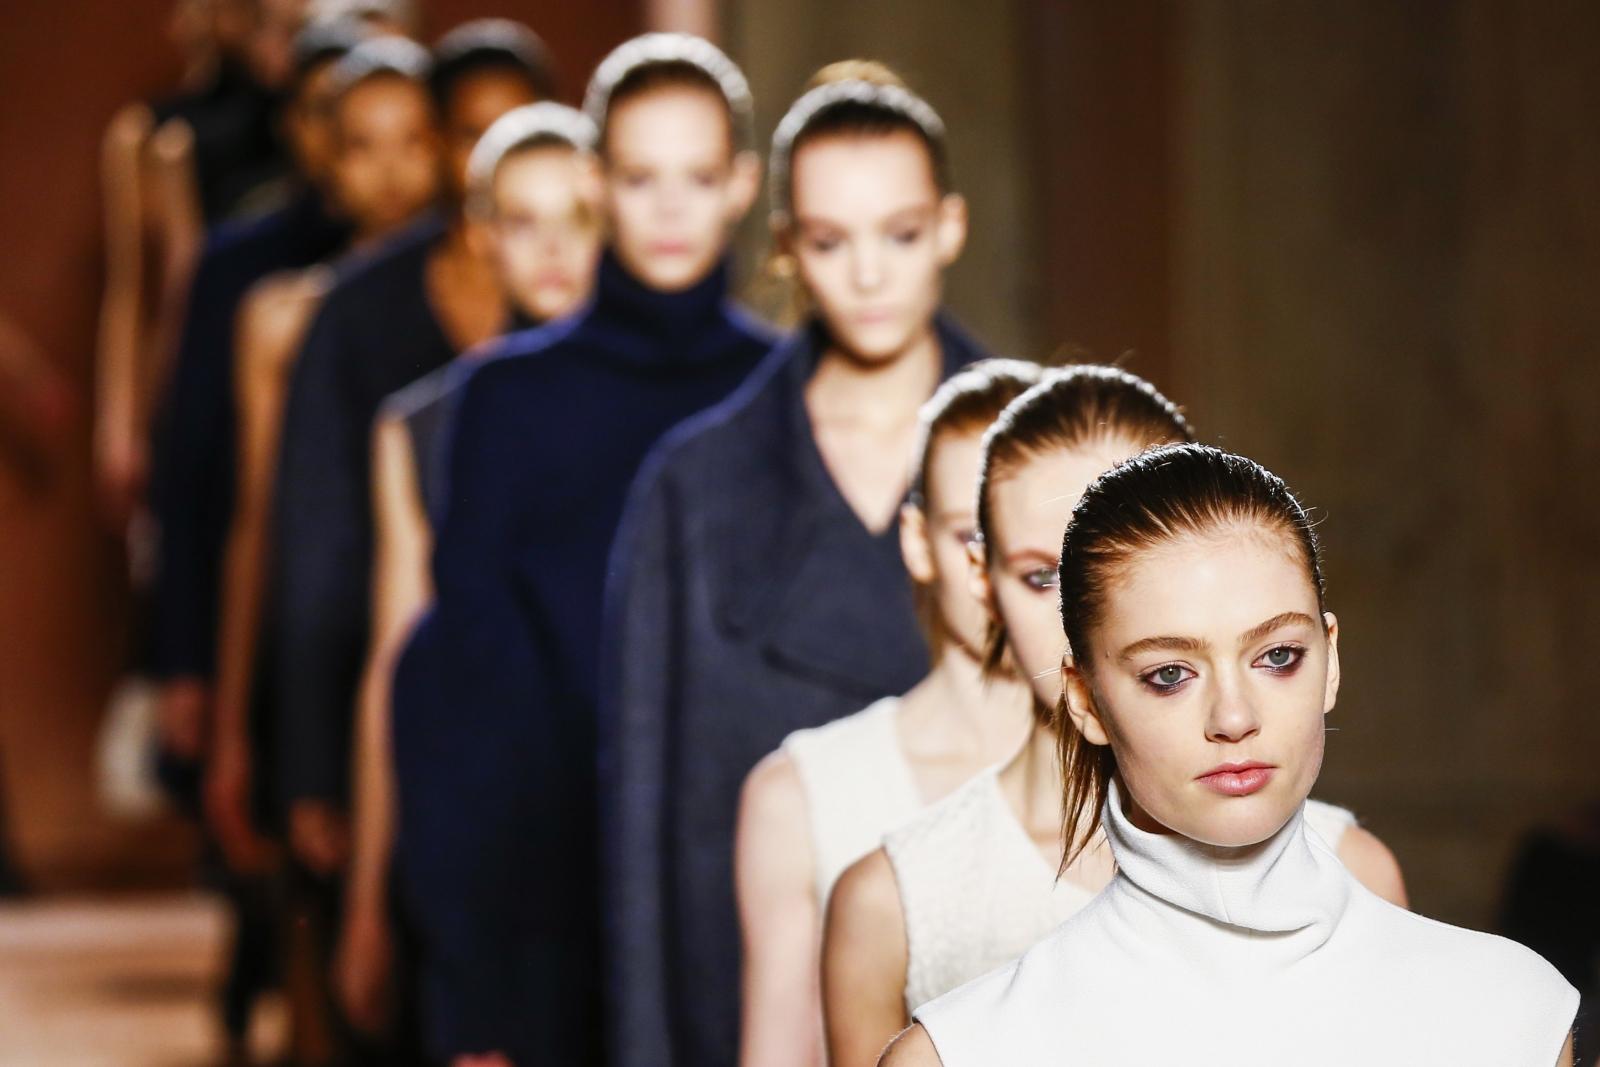 Victoria Beckham deconstructs for Fall 2015